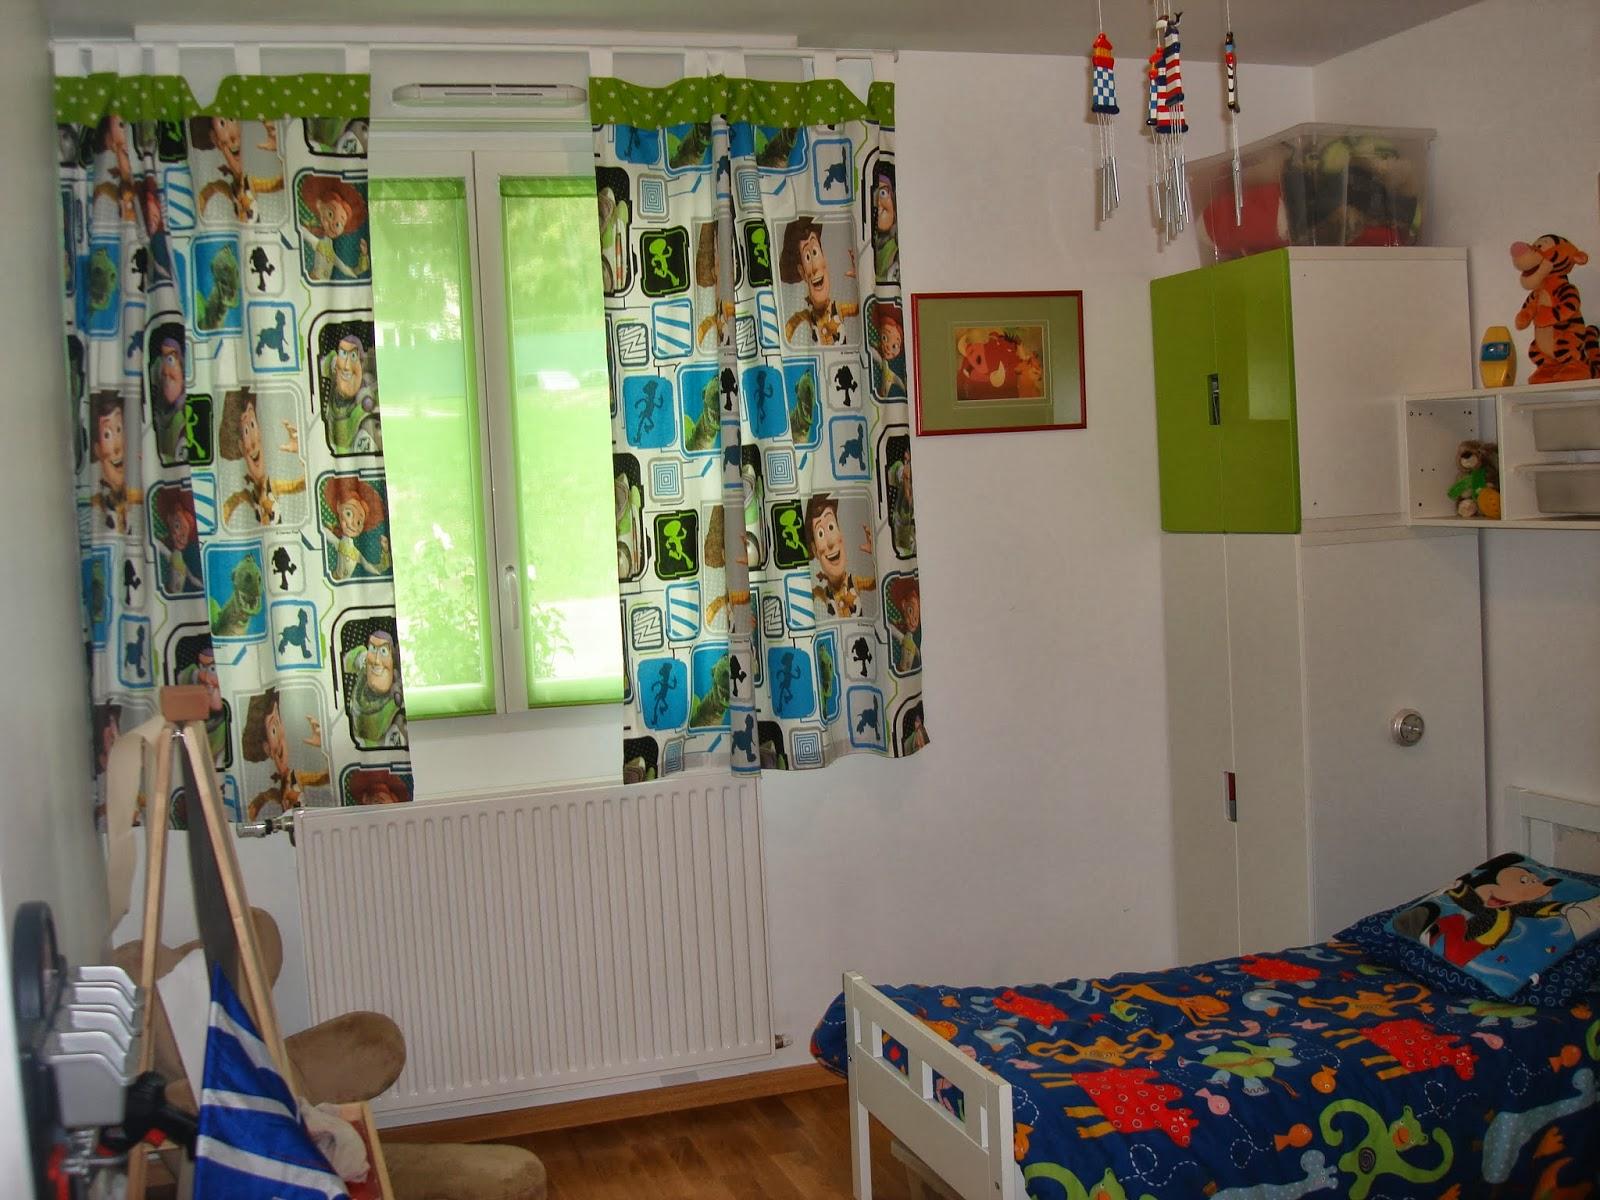 chambre gar on th me buzz l 39 clair latetedanslesetoiles y 39 a maman la maison. Black Bedroom Furniture Sets. Home Design Ideas